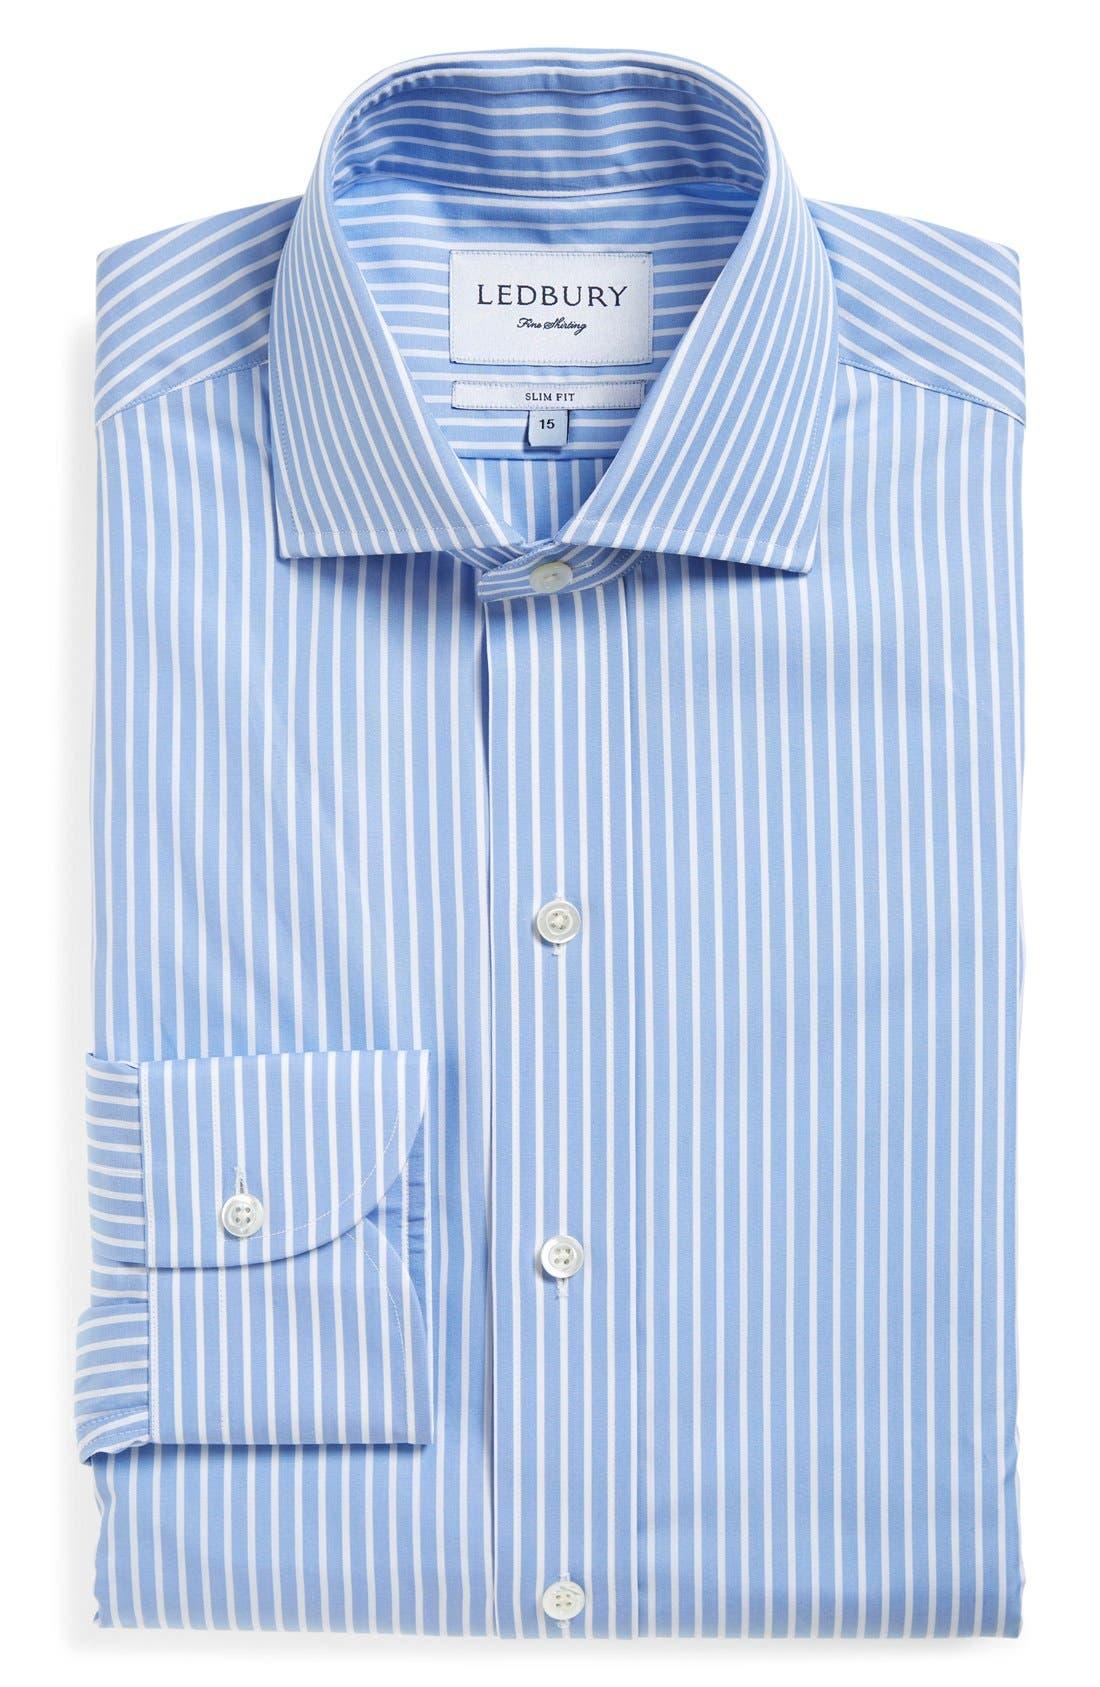 Ledbury 'Blue Banker' Slim Fit Stripe Dress Shirt